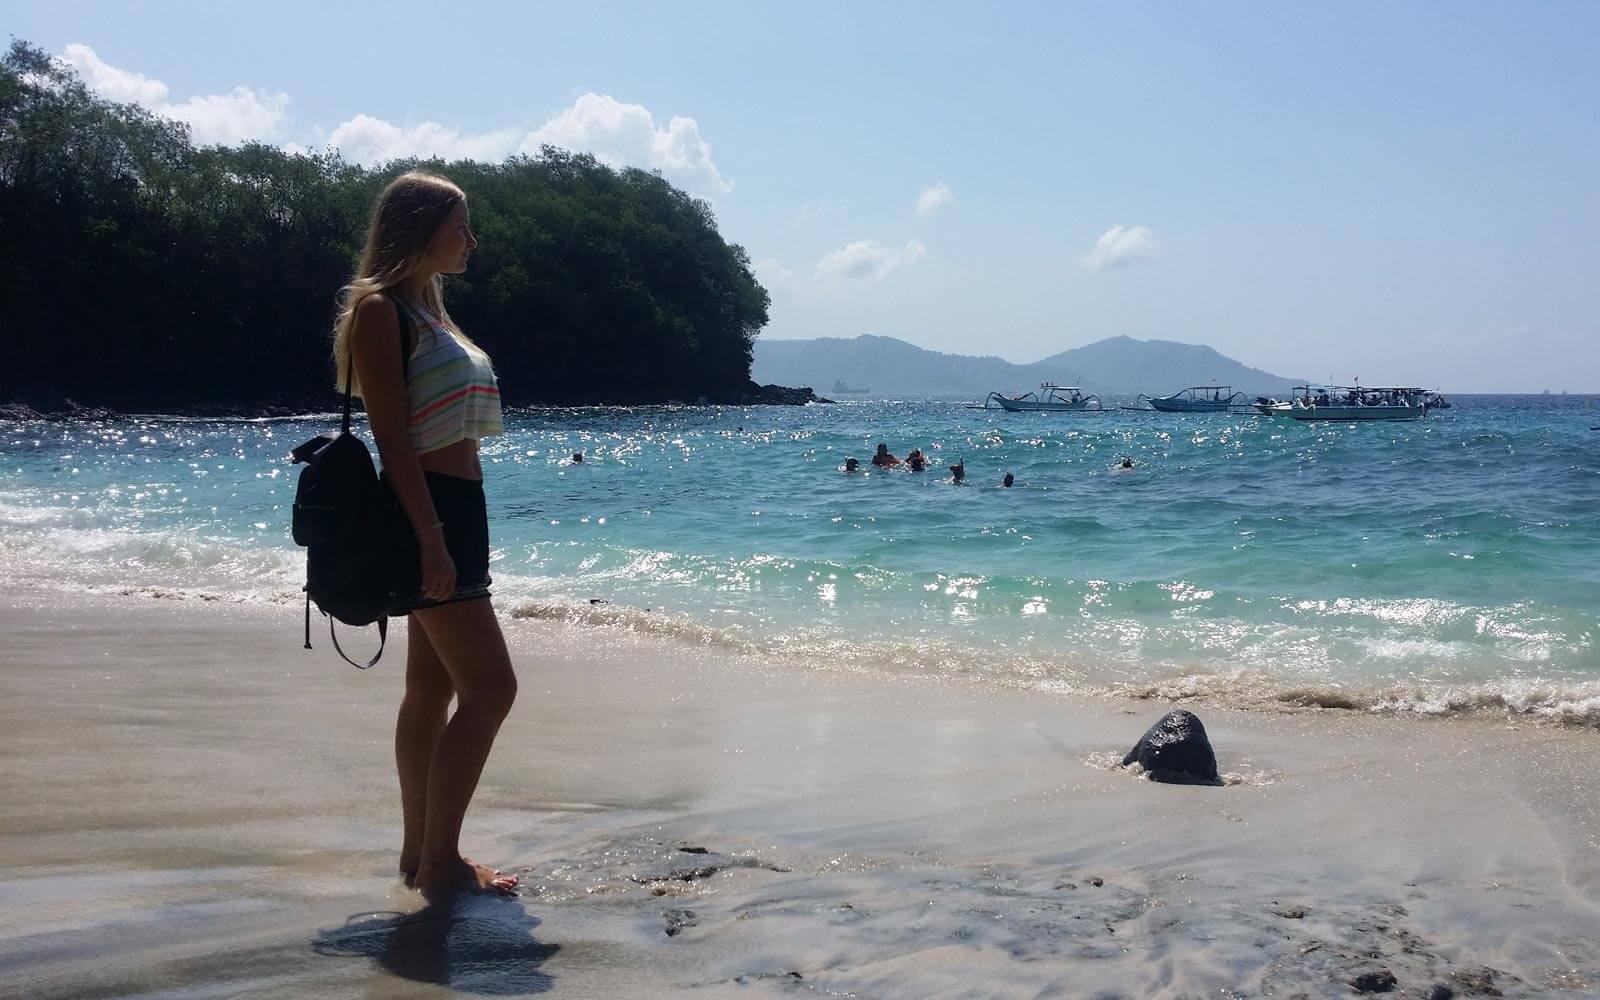 Elisa am Strand auf Bali